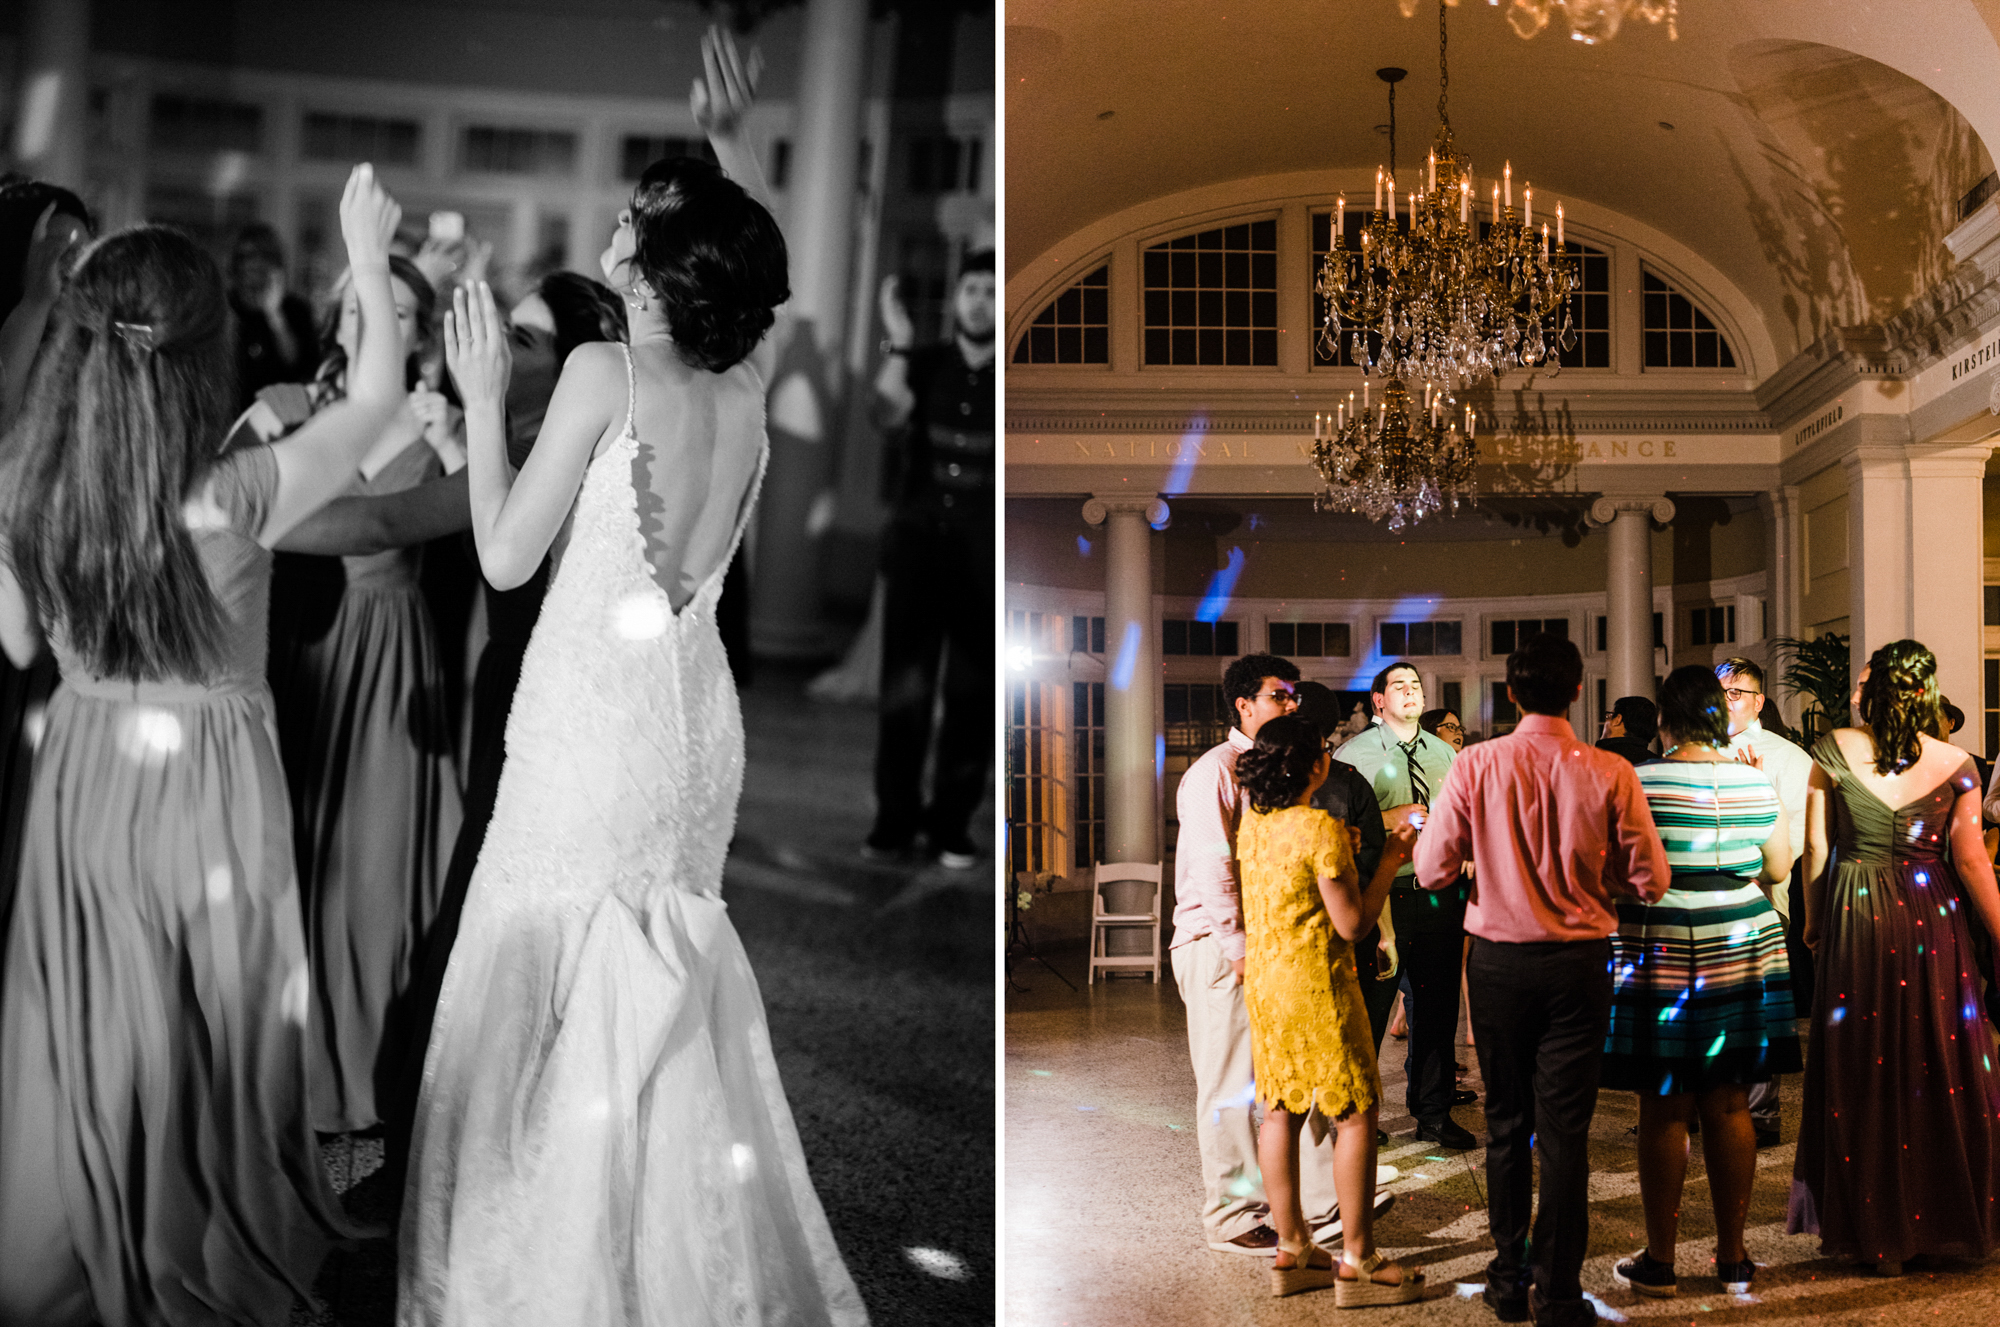 saratoga-springs-national-dance-eclectic-downtown-charlotte-film-wedding-photographer-carousel-37.jpg